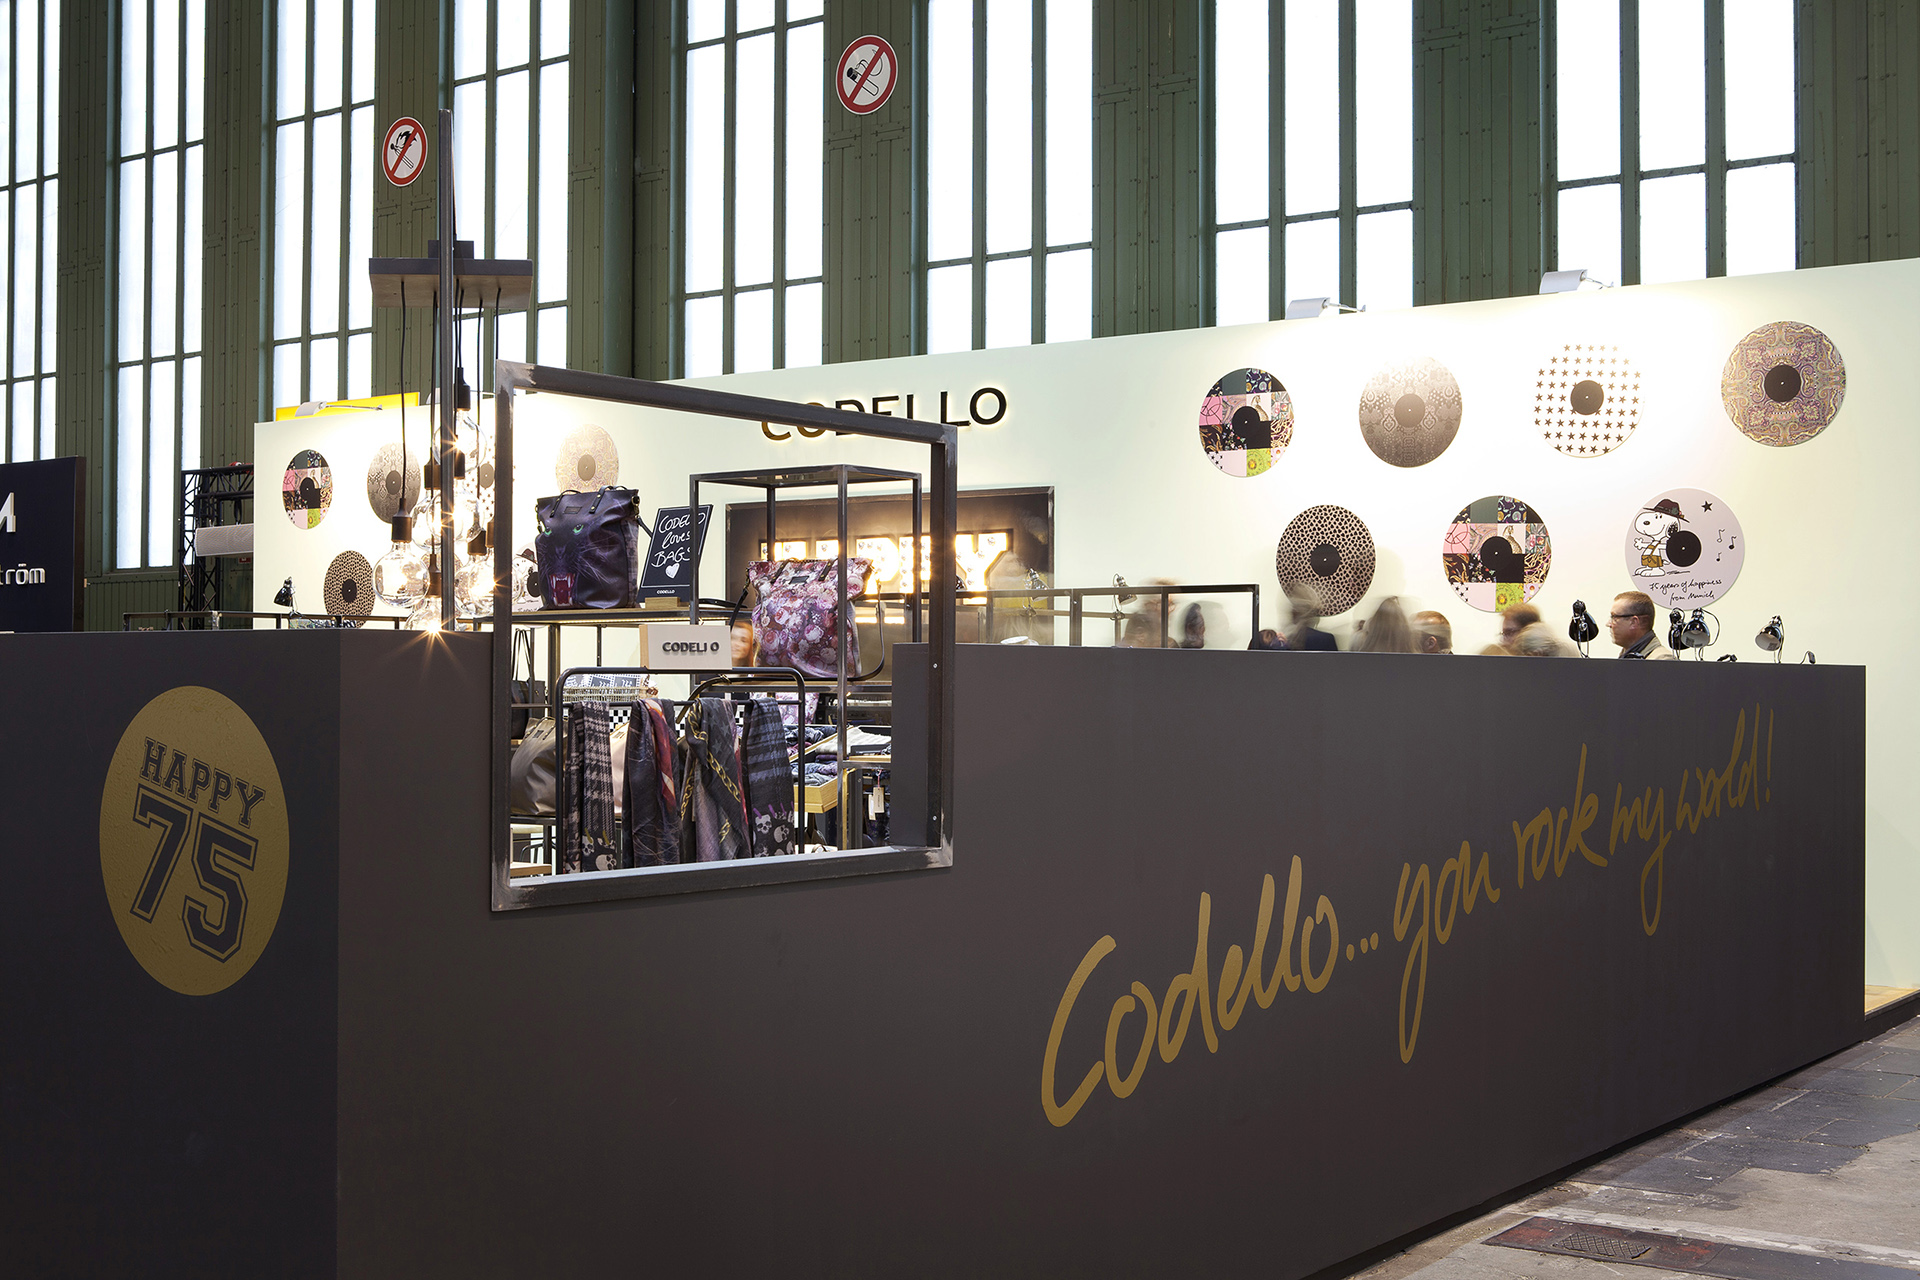 009-codello-bread-butter-berlin-trade-fair-design-buero-philipp-moeller-2014.jpg